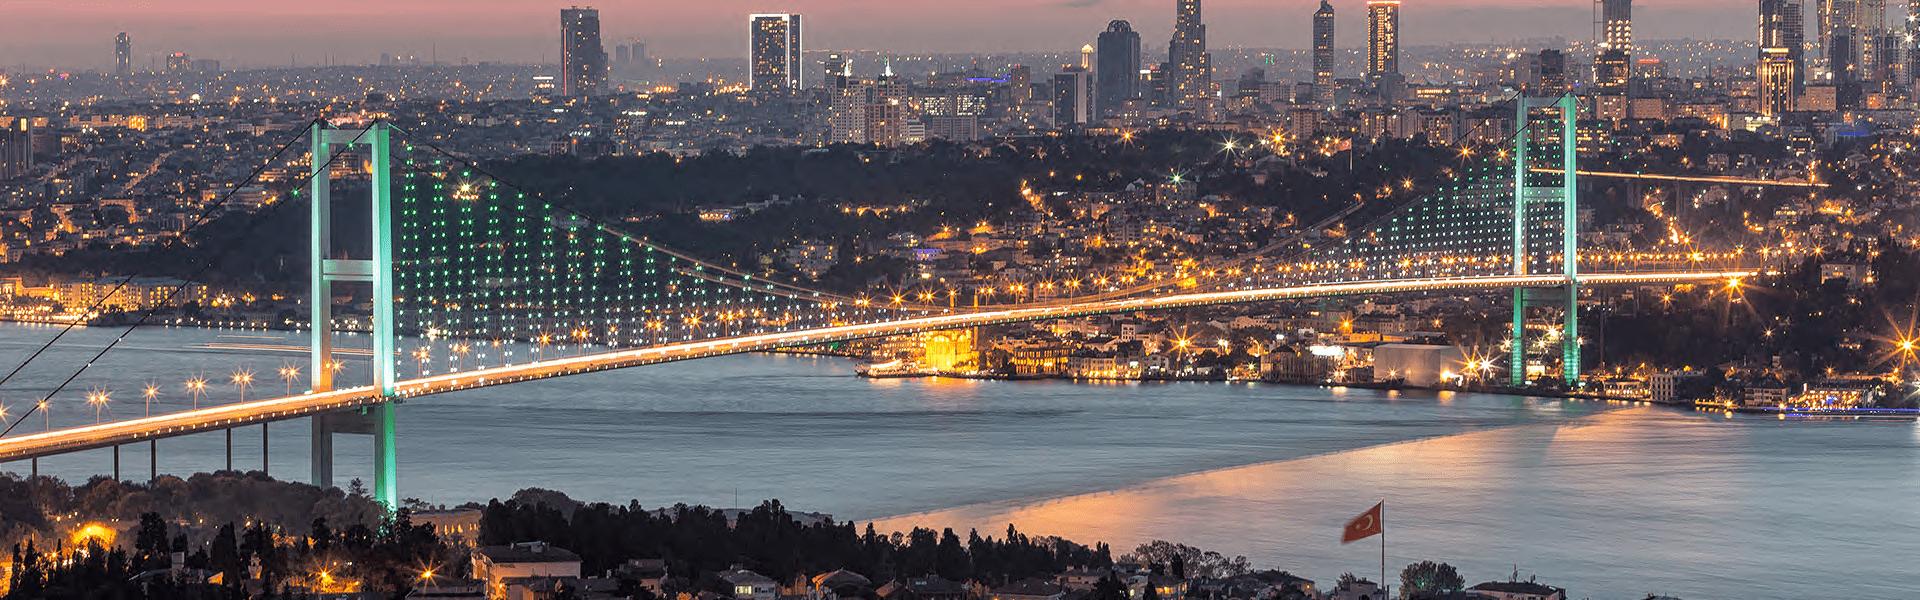 istanbul-hero-image